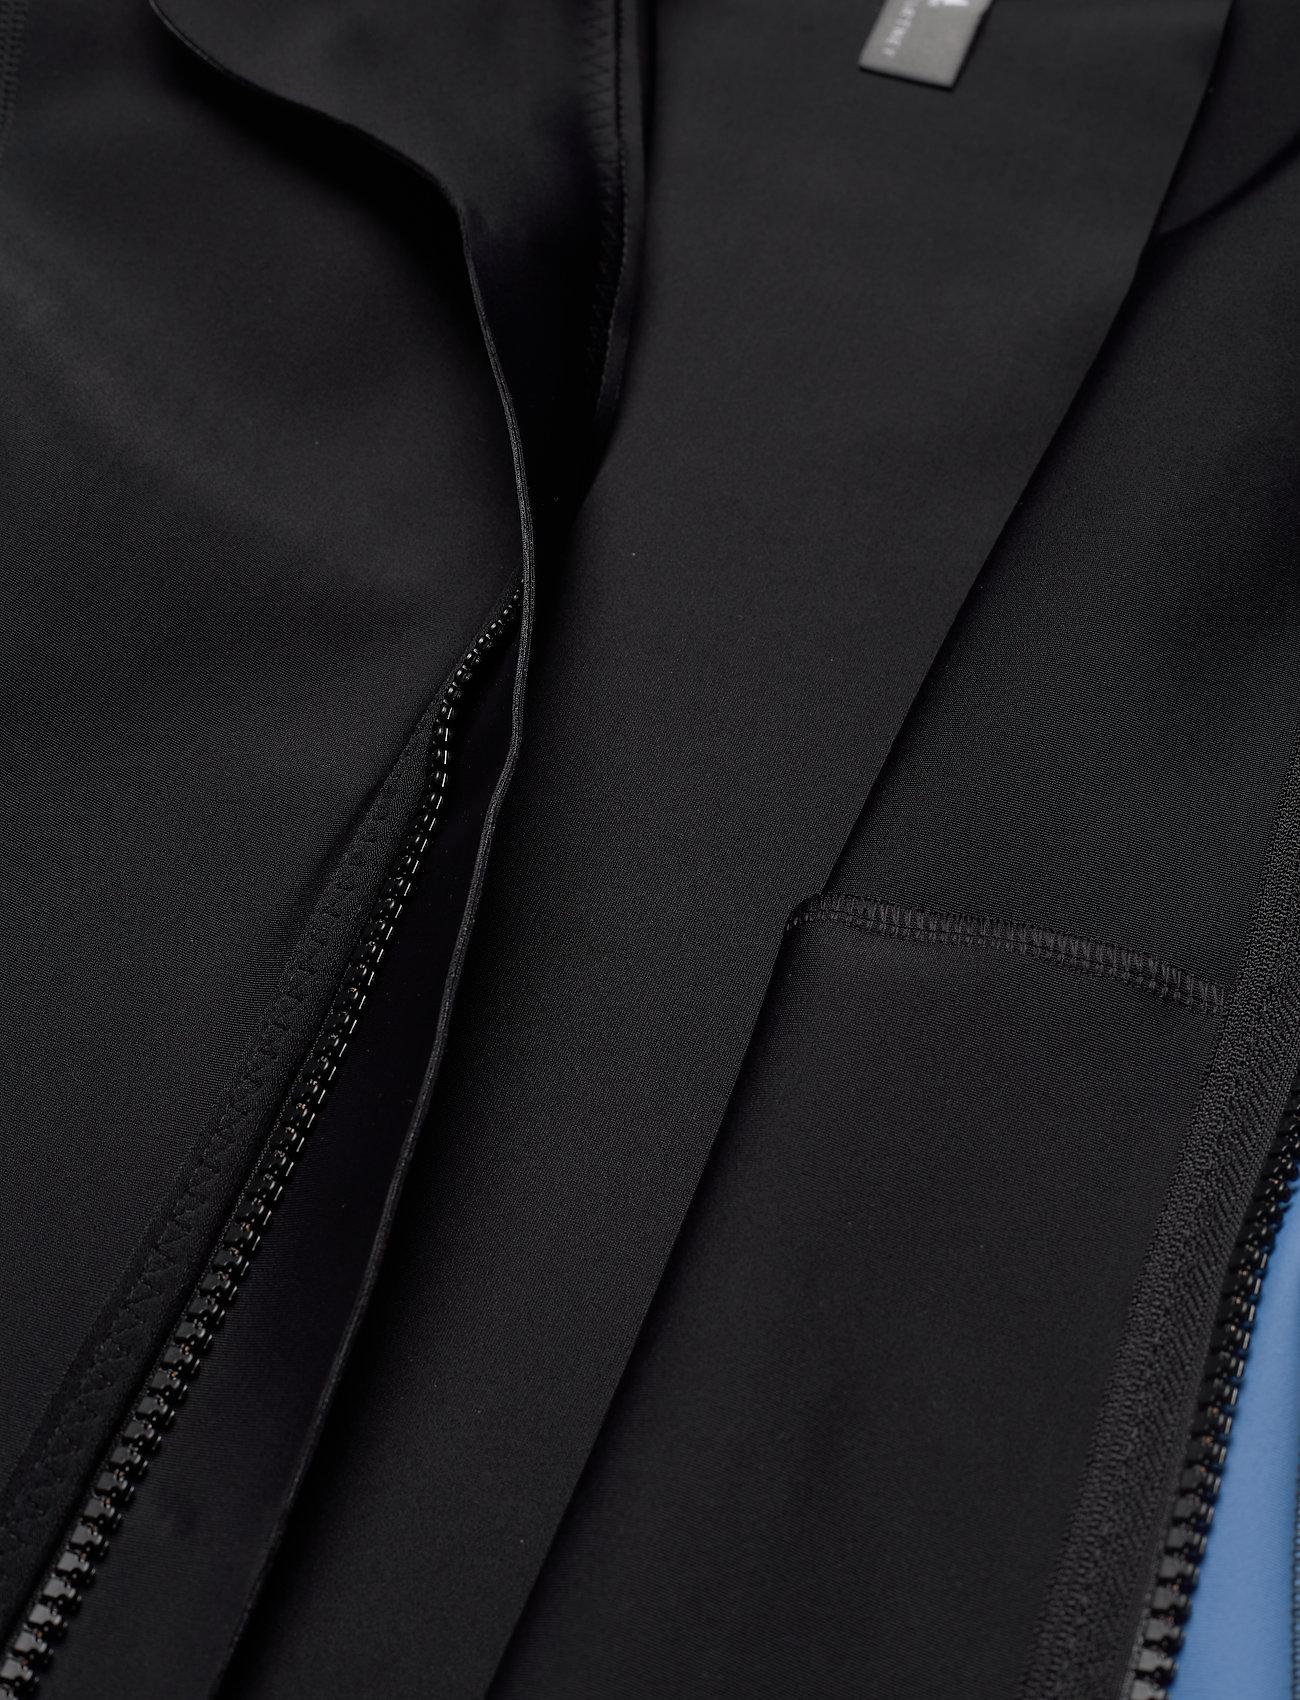 adidas by Stella McCartney - BeachDefender Midlayer Jacket W - sweatshirts & hoodies - black/stoblu - 8